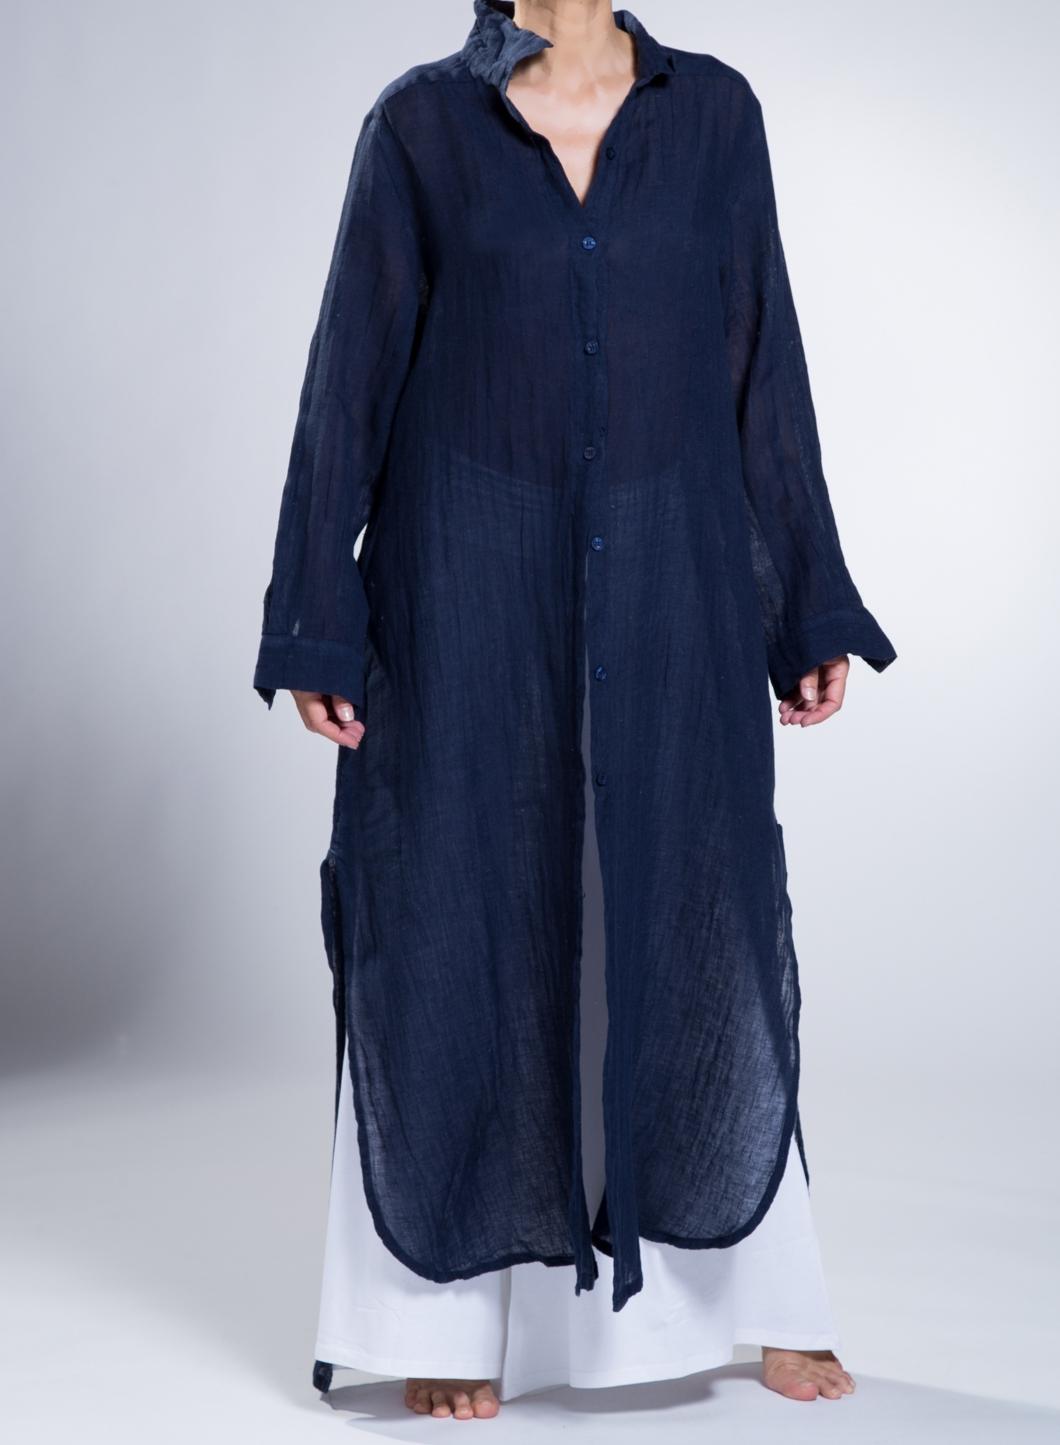 a3ceb74a8fb1 ... Φόρεμα